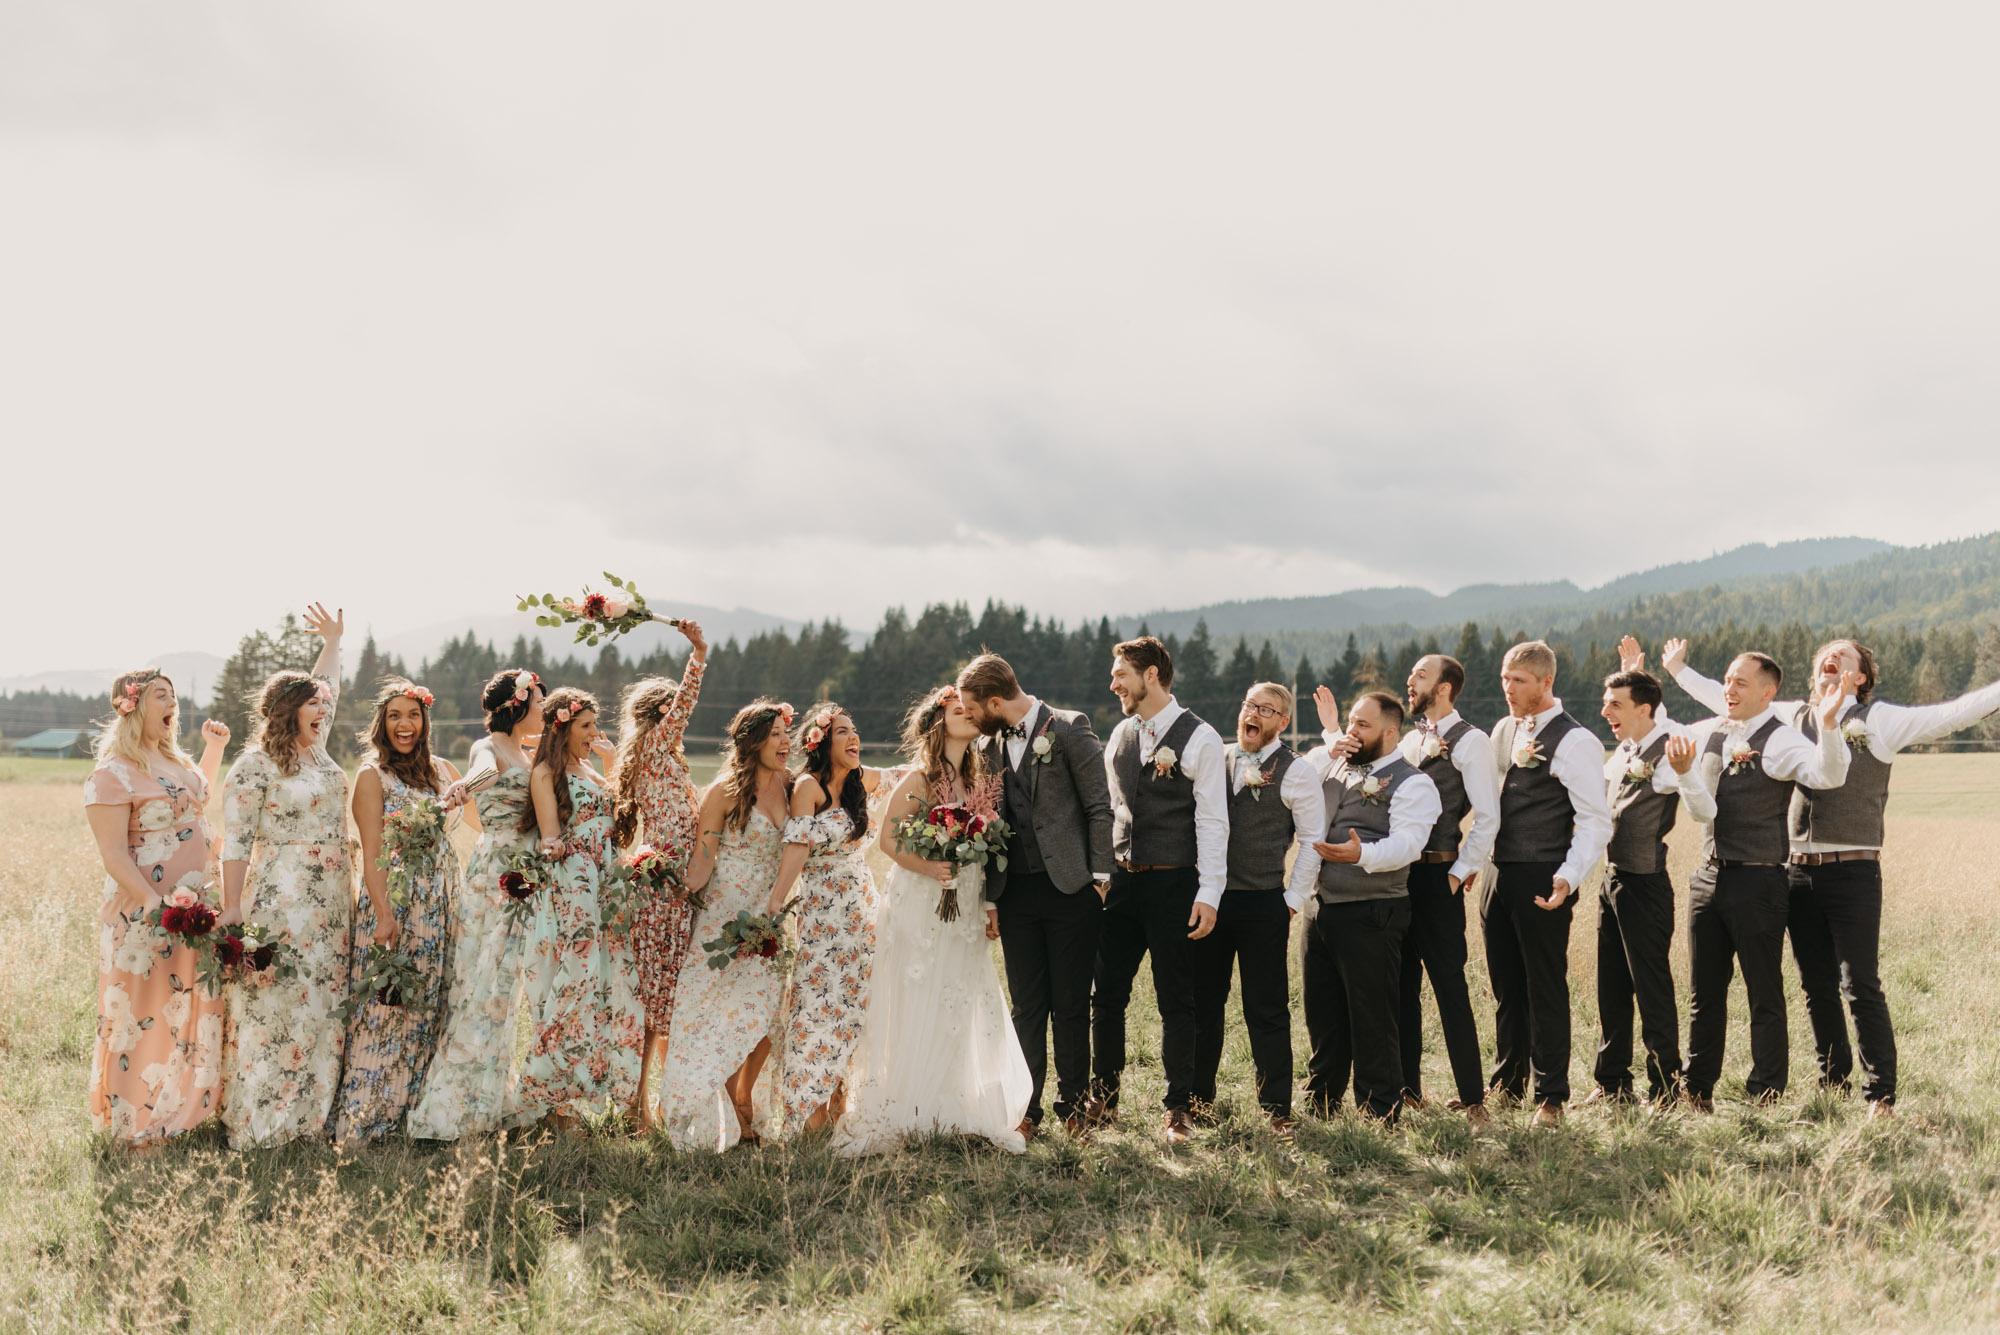 Bridal-Party-Free-People-Flower-Dresses-Washington-Wedding-8606.jpg